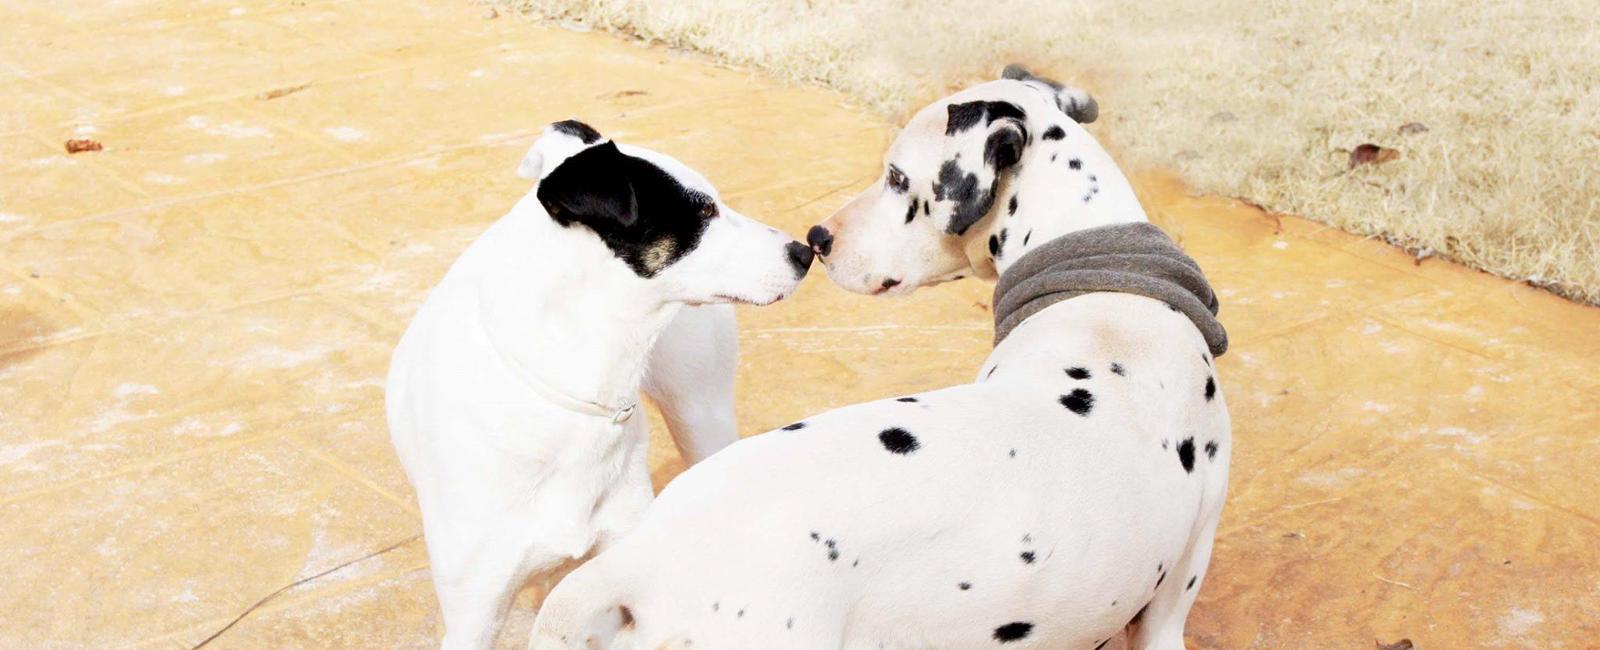 SOS Animalicos - Save one life today